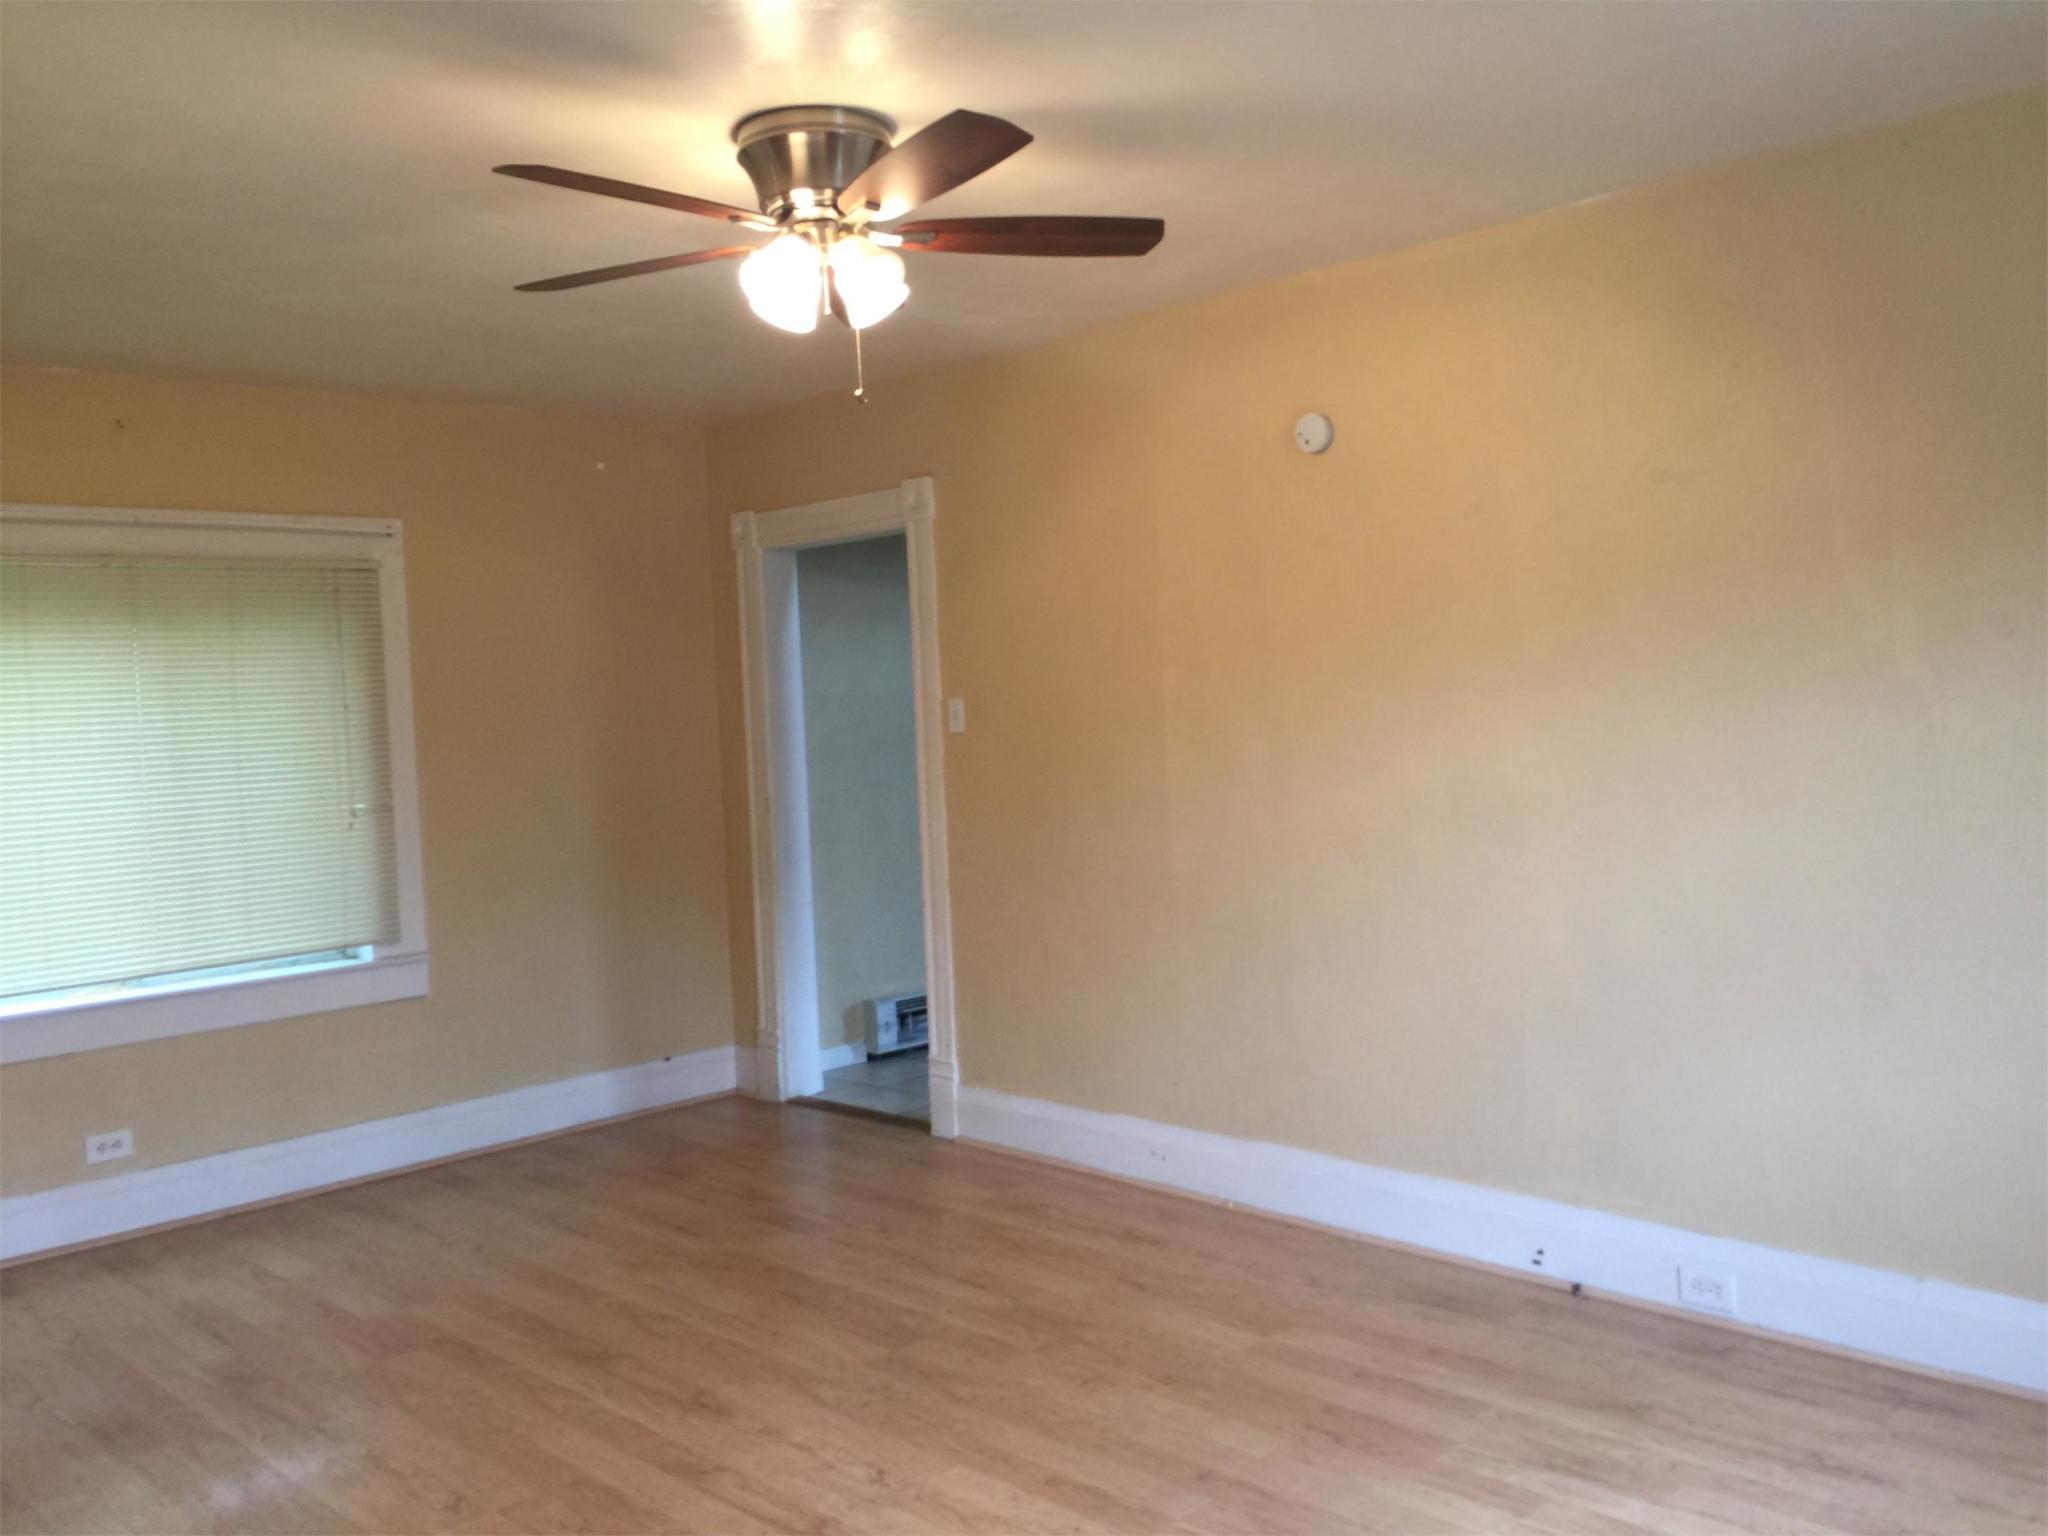 9 Sherman Ave, Dravosburg, PA 15034 For Rent | Trulia